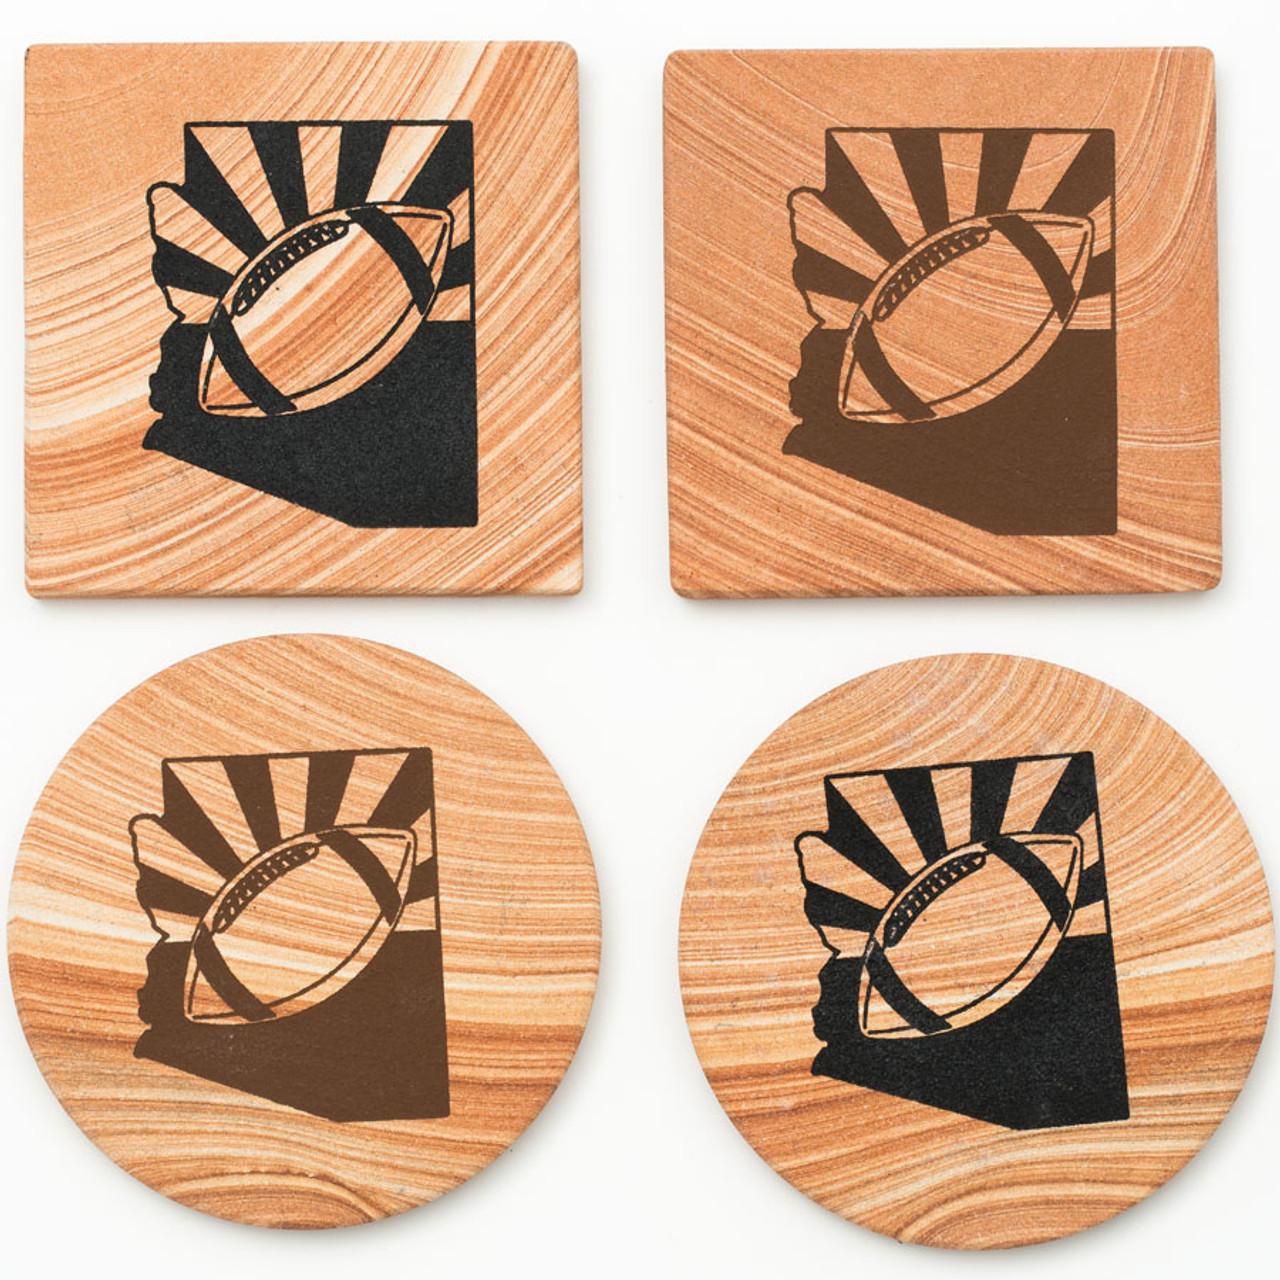 Arizona Football Coasters - Set of 4